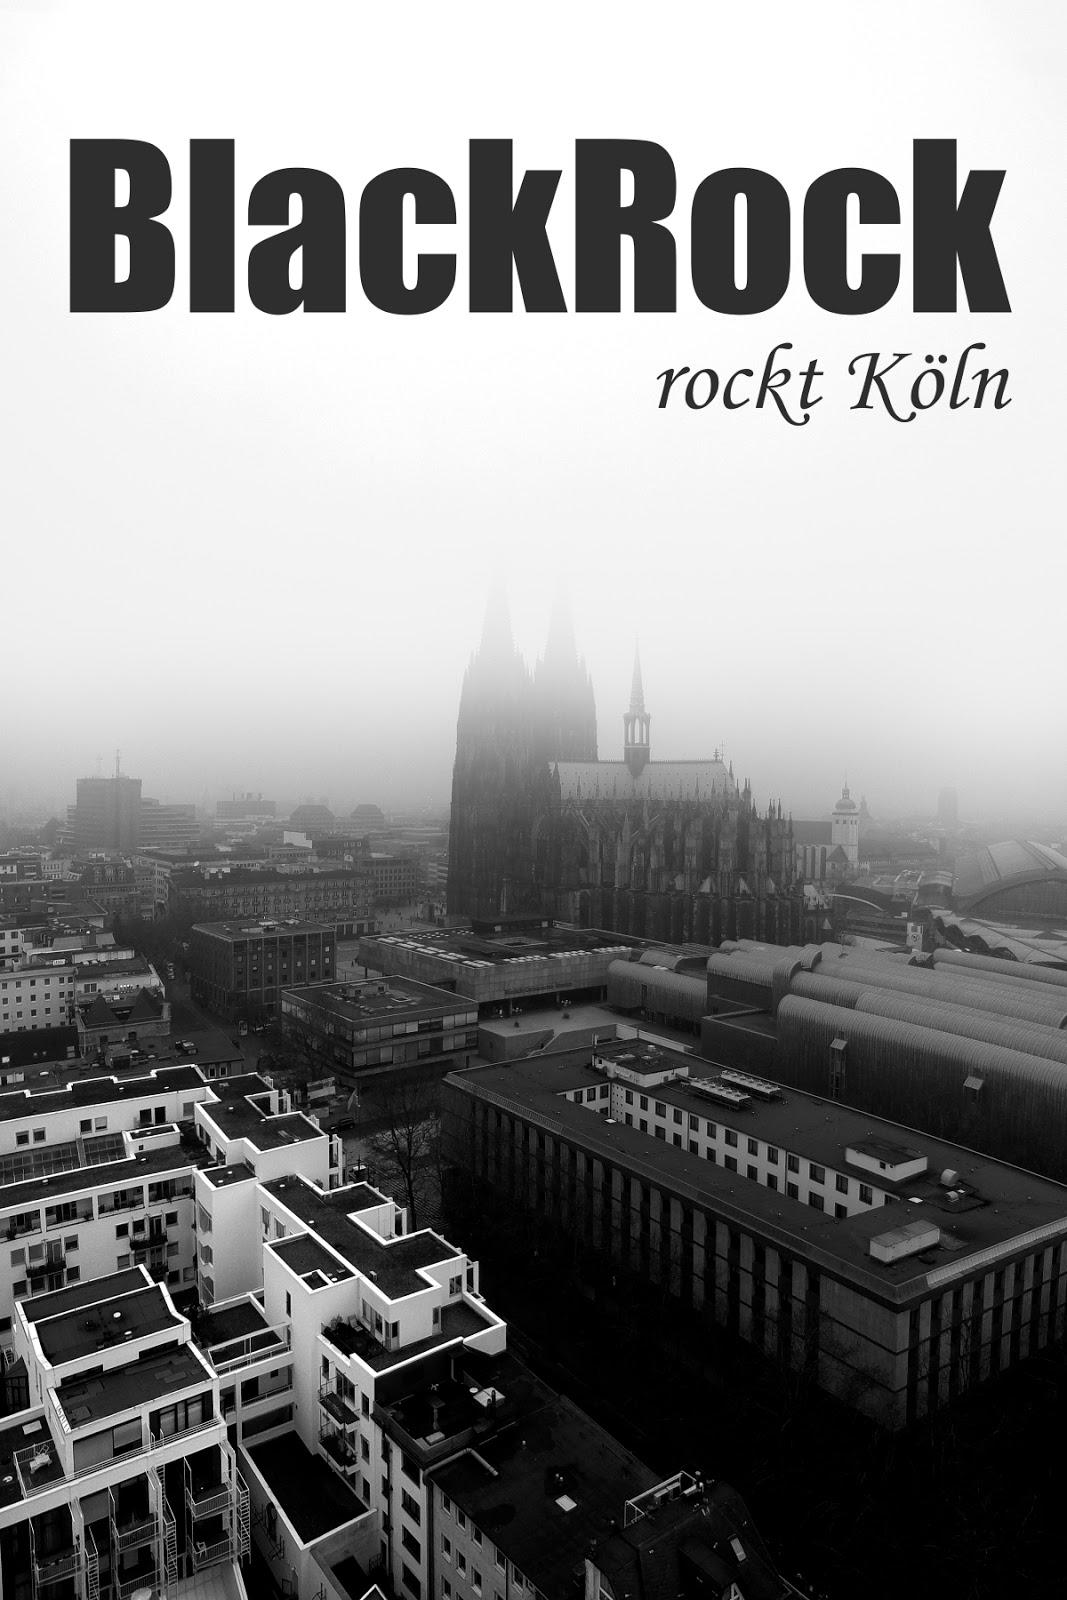 Köln, BlackRock, Bayer AG, Monsanto, Flughafen Köln/Bonn, undemokratisch, Einfluss, Macht, Geld, unkontrolliert